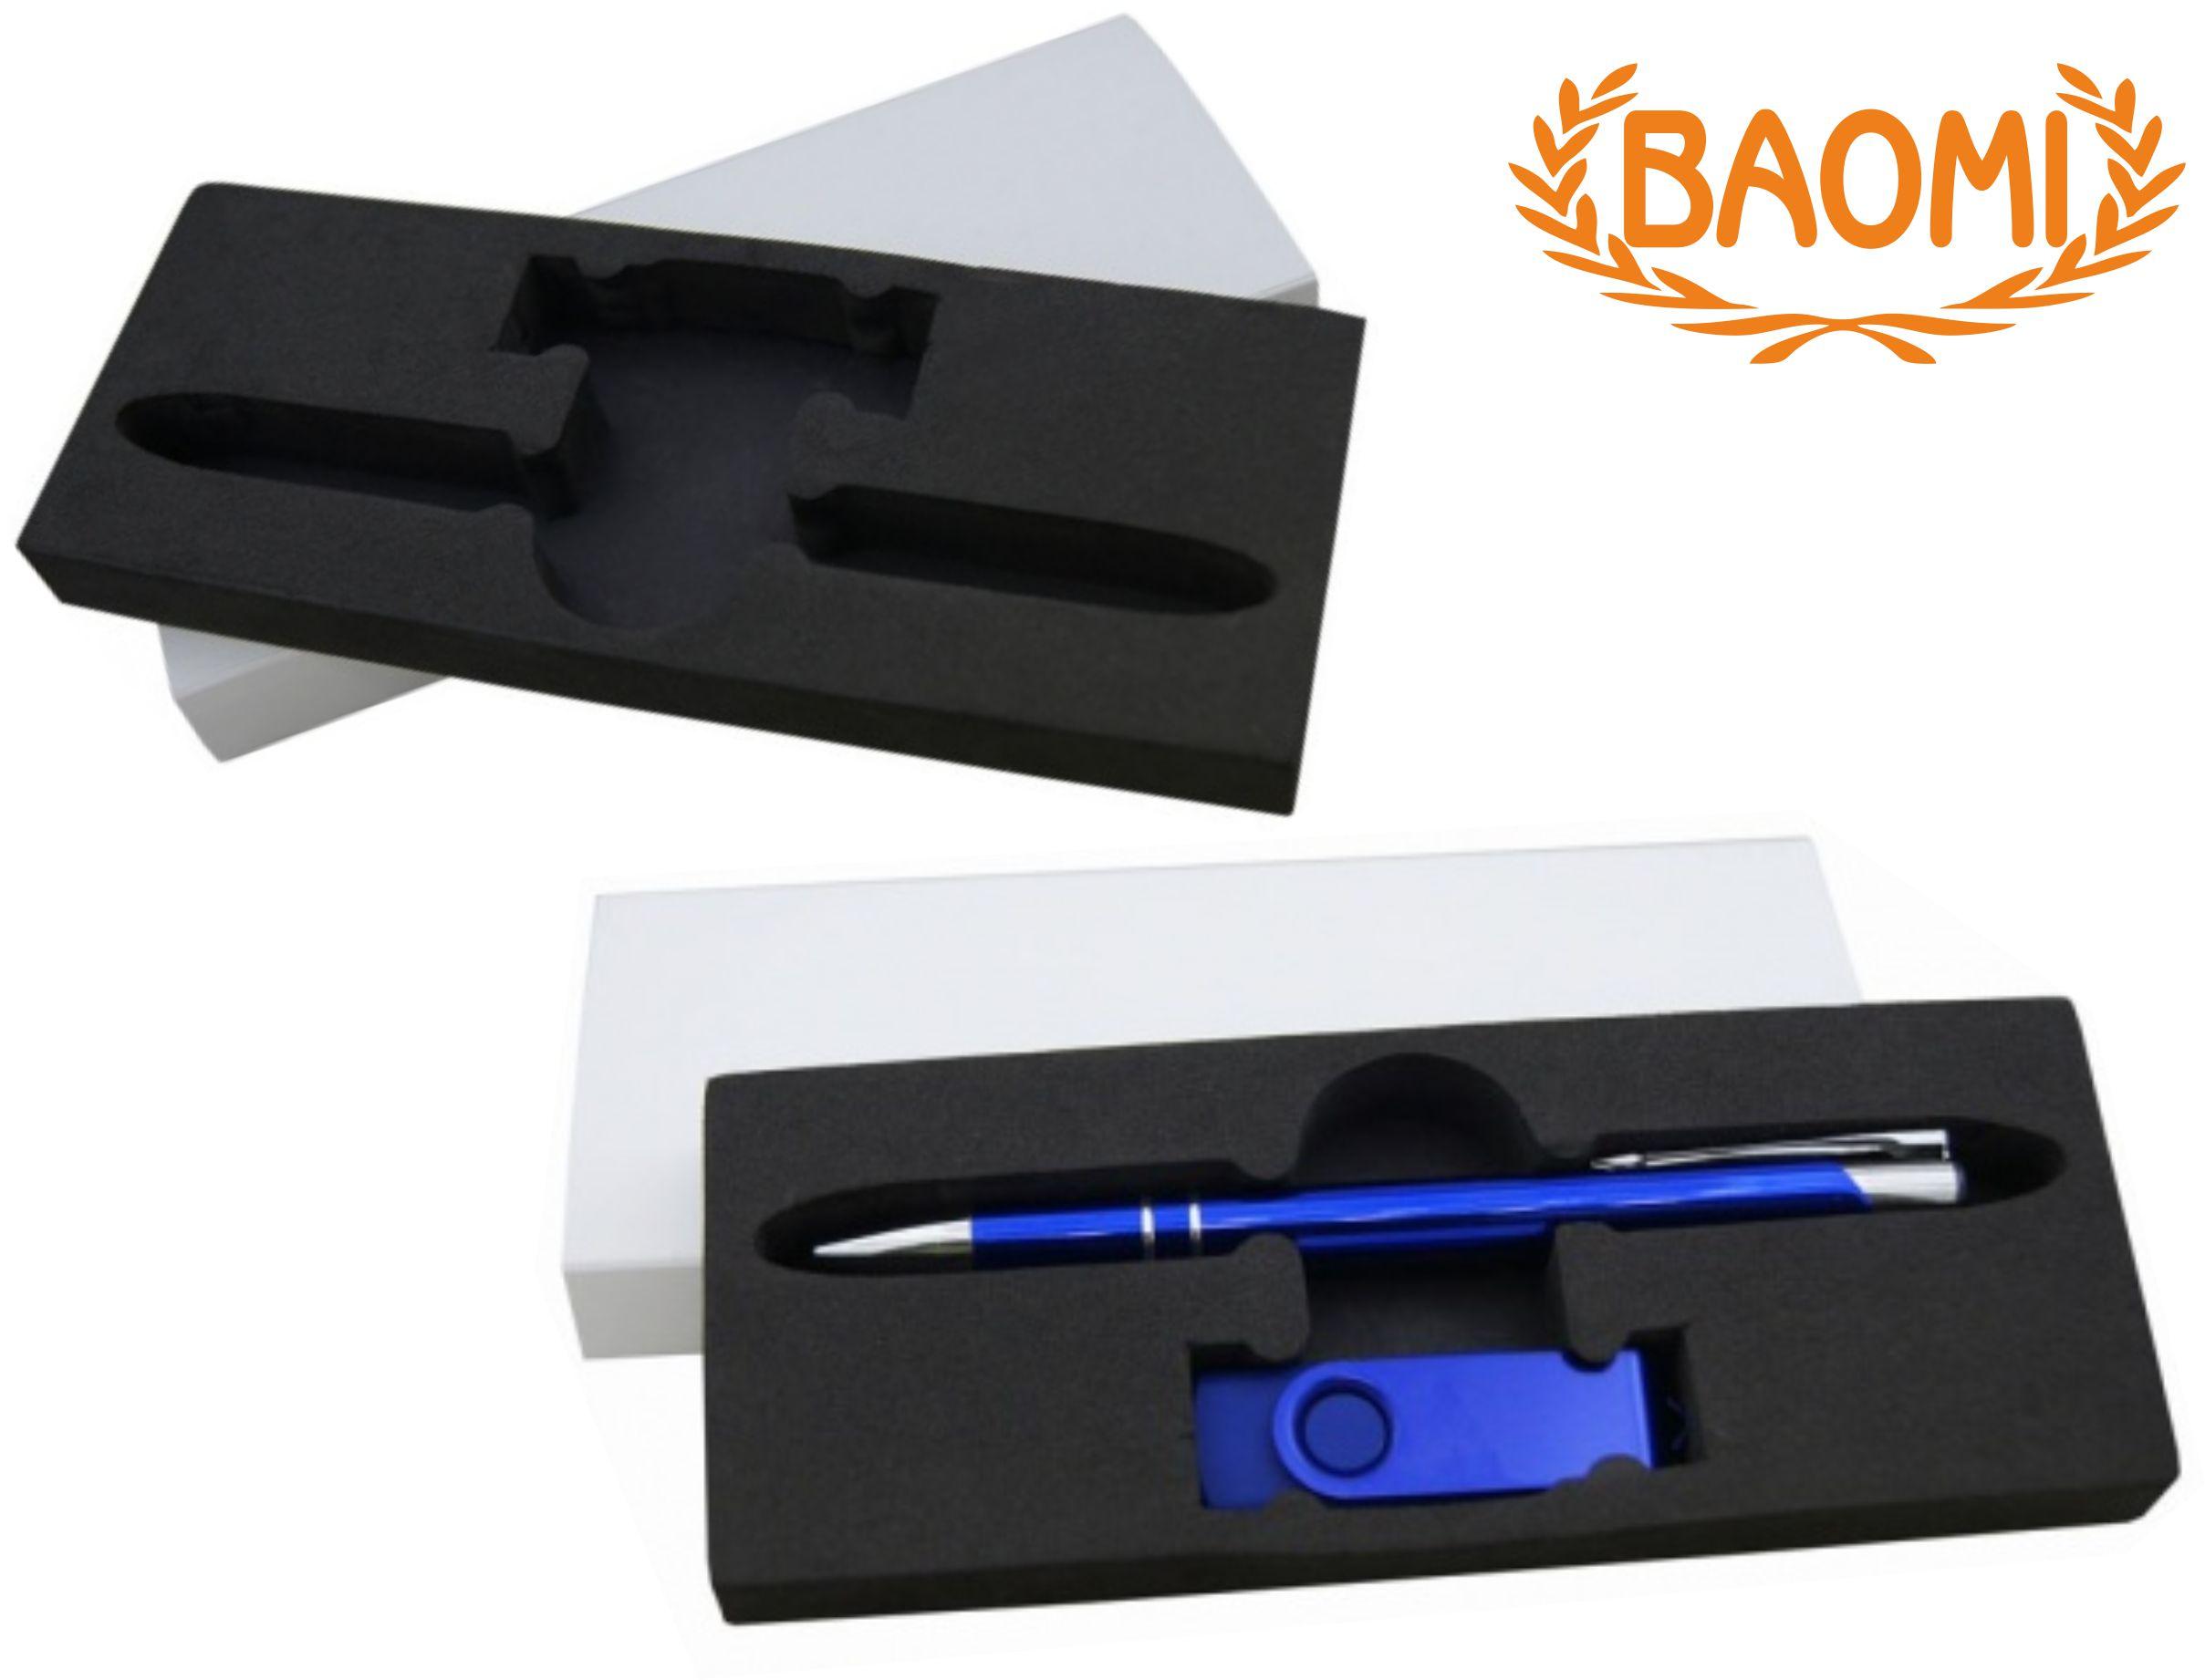 футляр для флешки и ручки